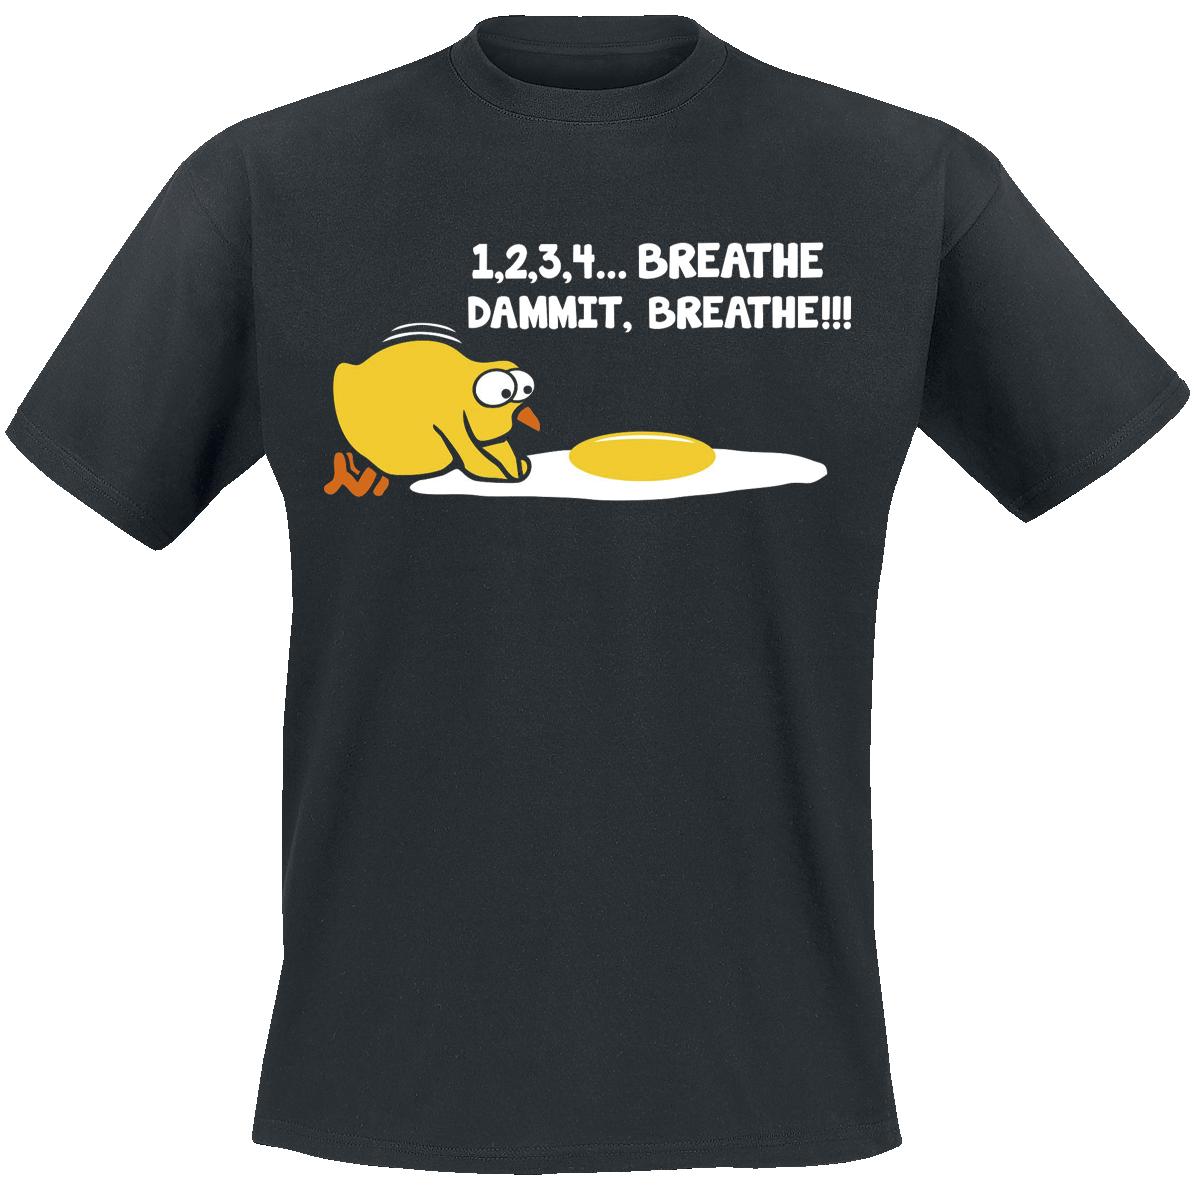 1,2,3,4... Breathe, Dammit, Breathe!!! - - T-Shirt - black